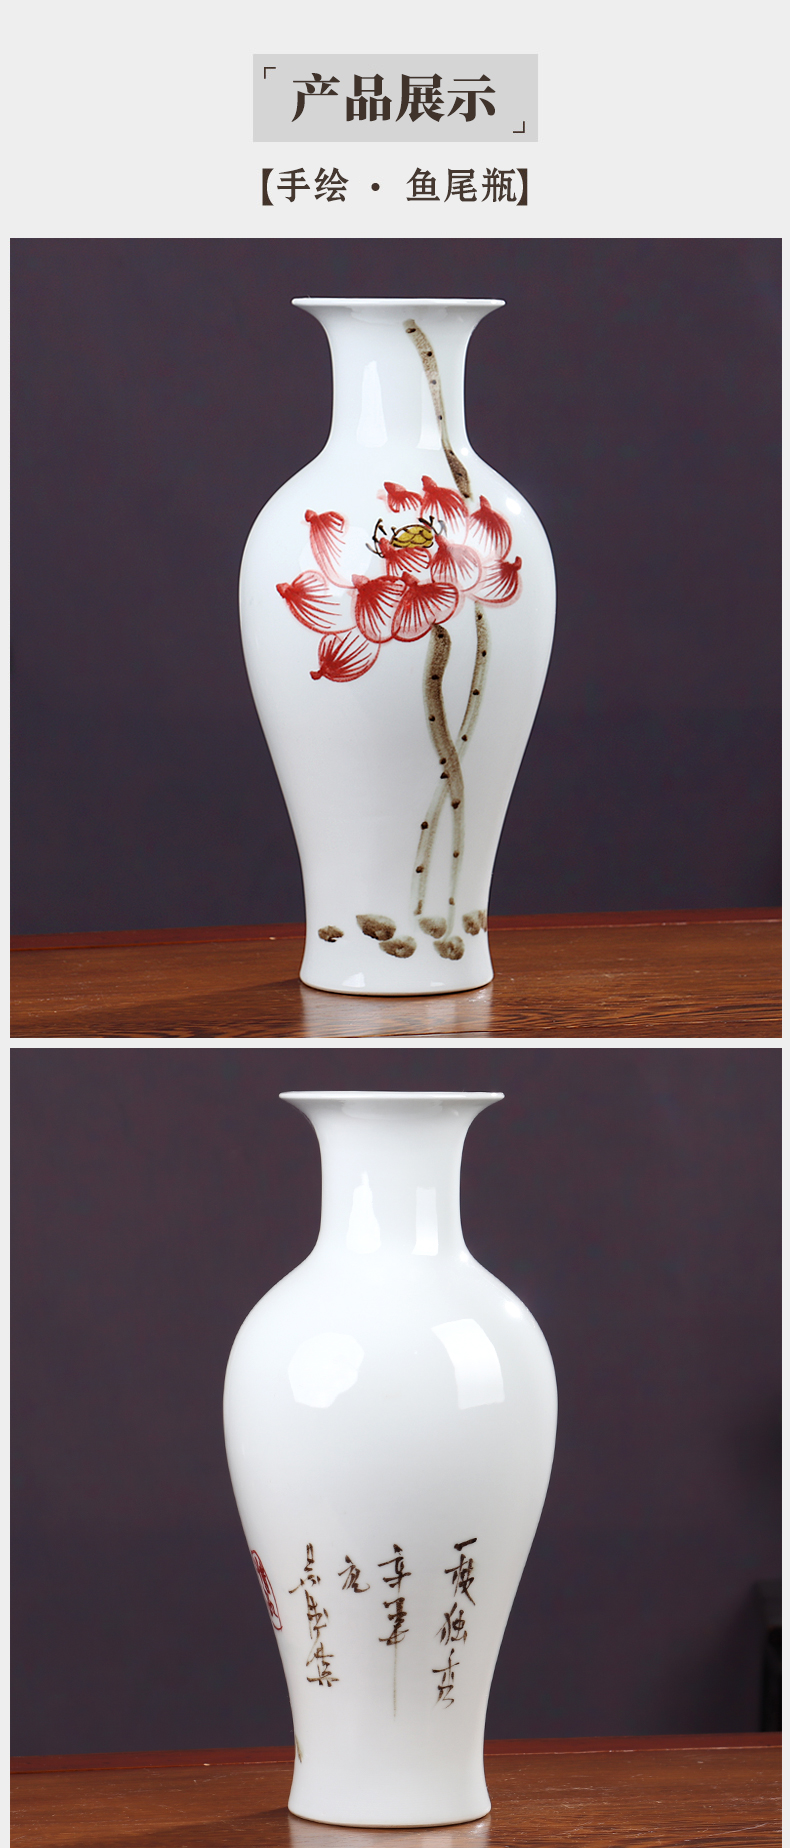 Hand made lotus lucky bamboo bamboo bottle vase furnishing articles sitting room of jingdezhen ceramics handicraft home decoration